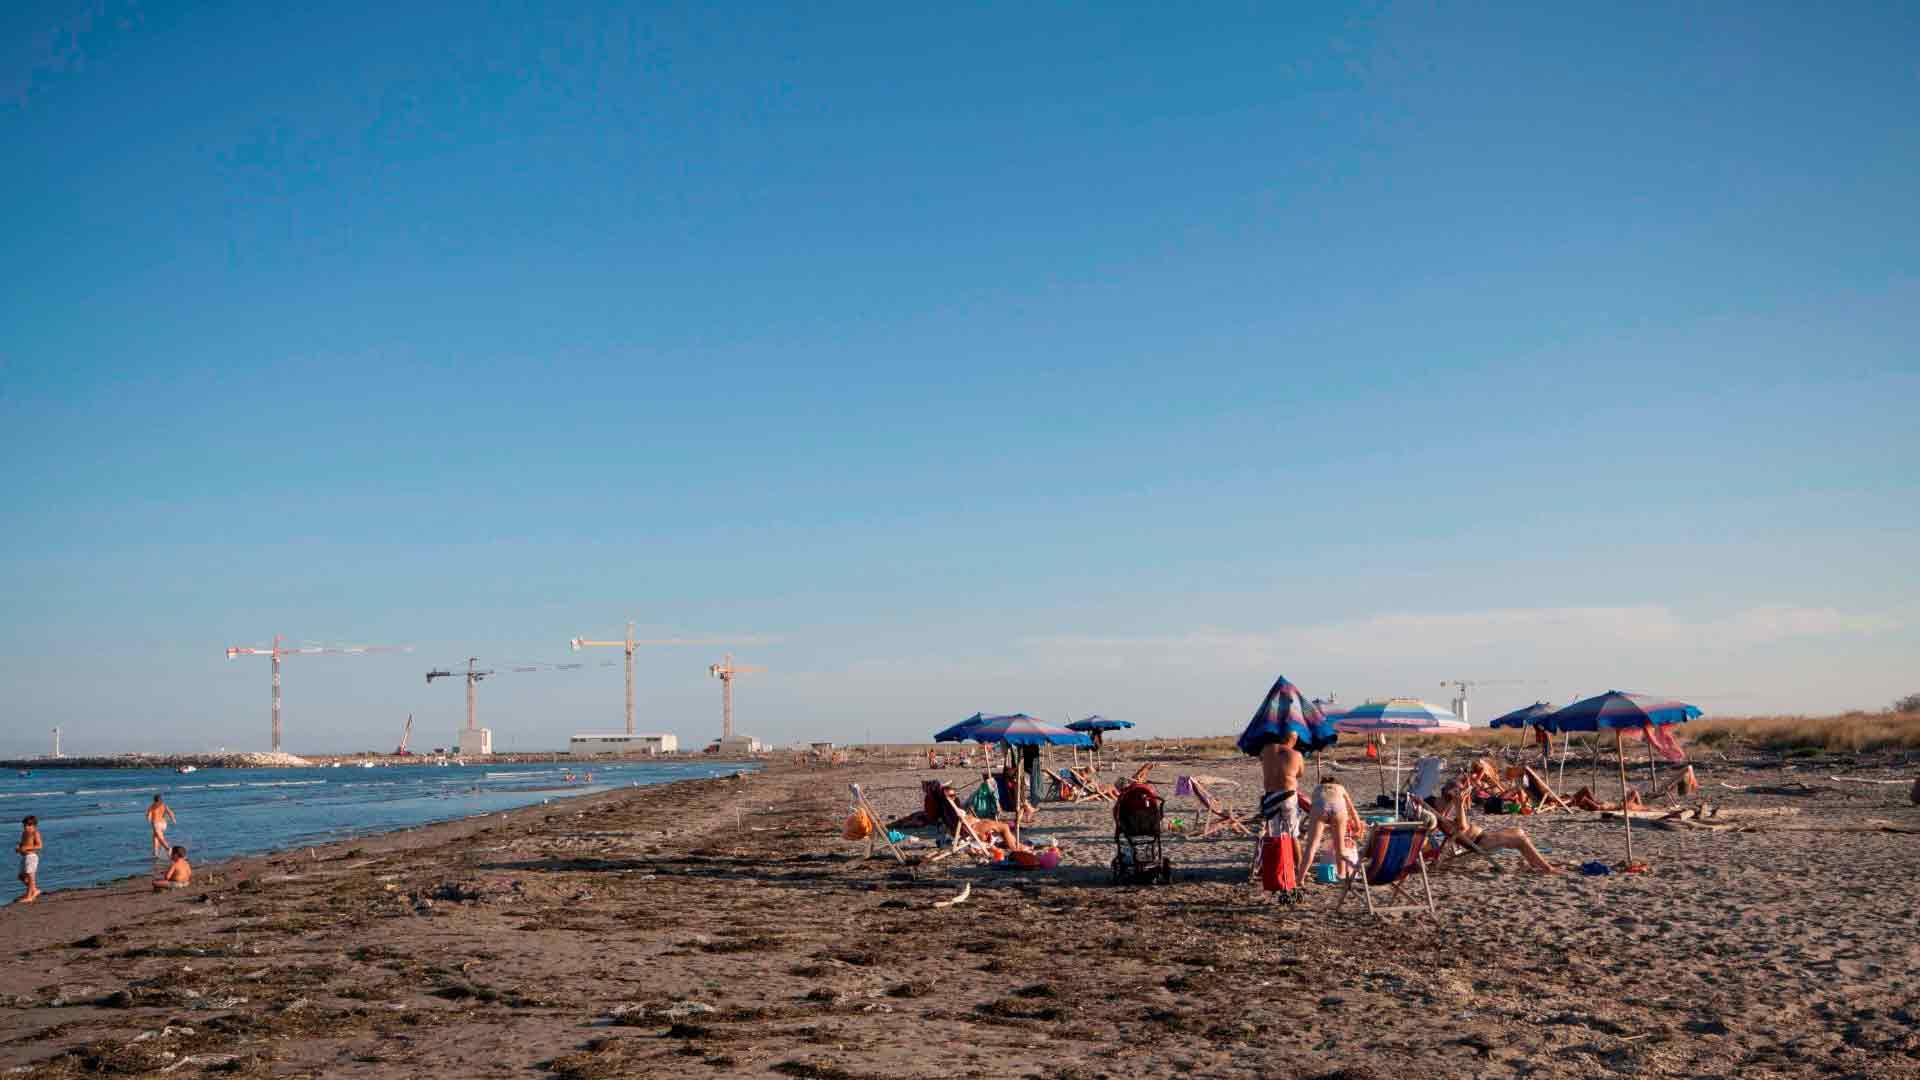 Pellestrina - Ca' Roman La spiaggia